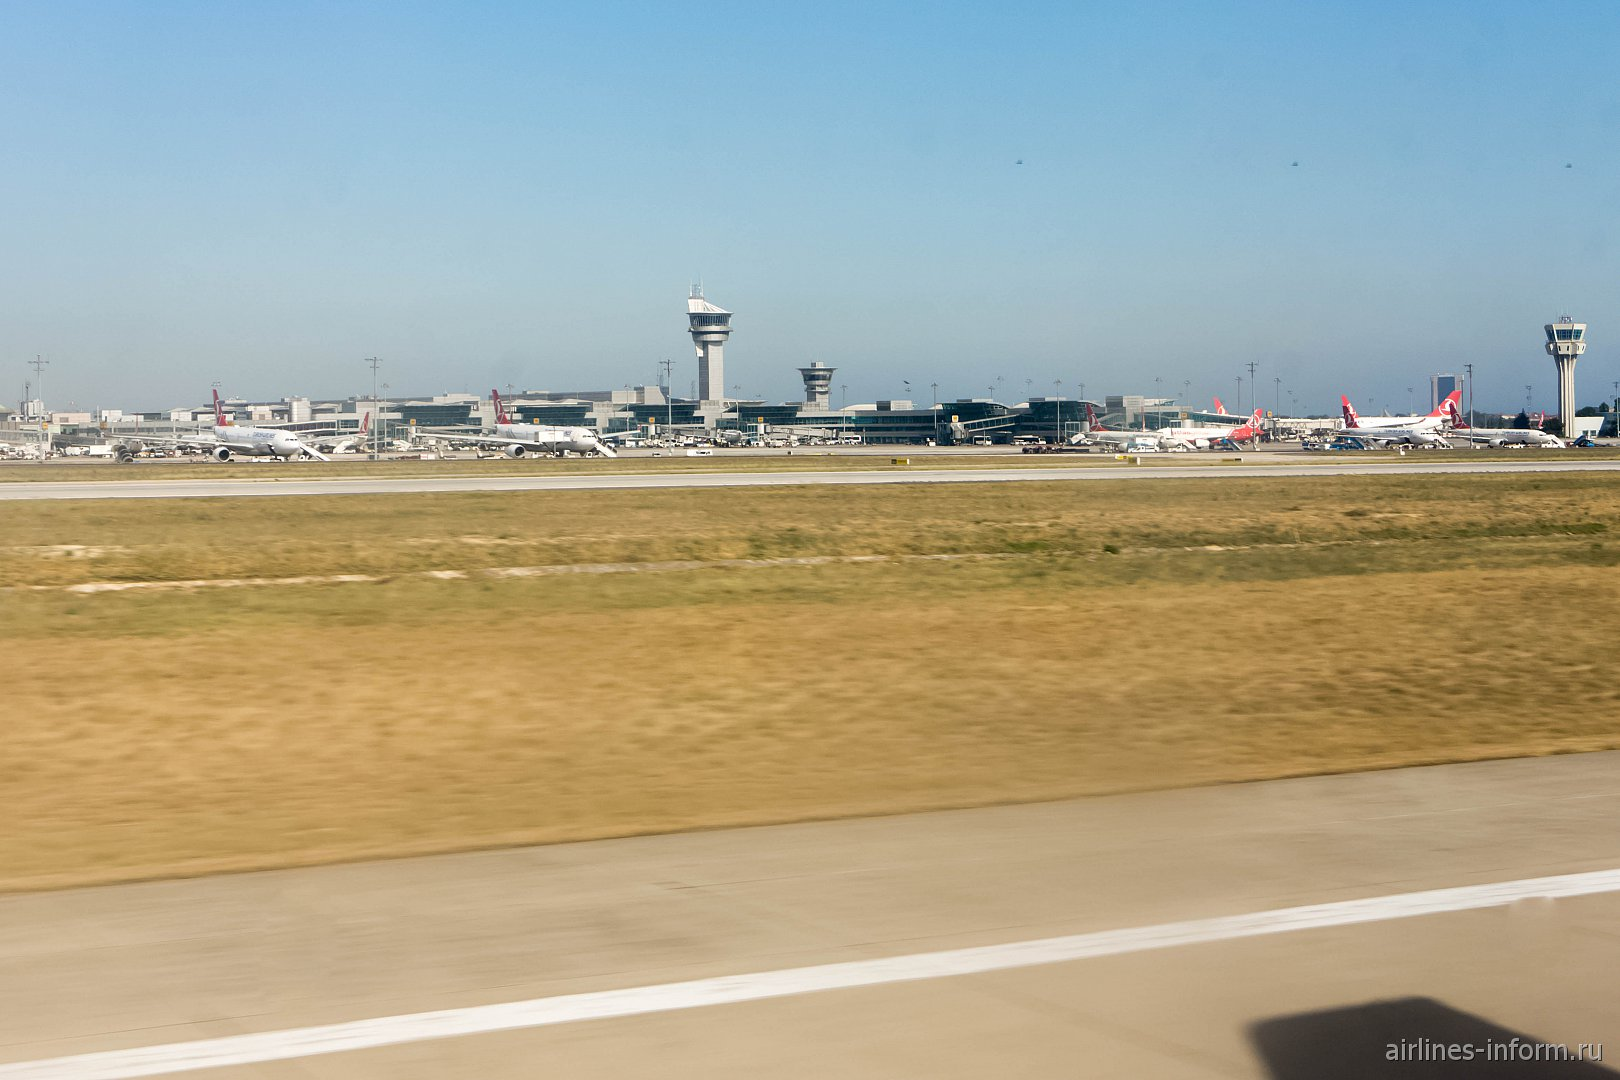 Аэропорт Стамбул имени Ататюрка